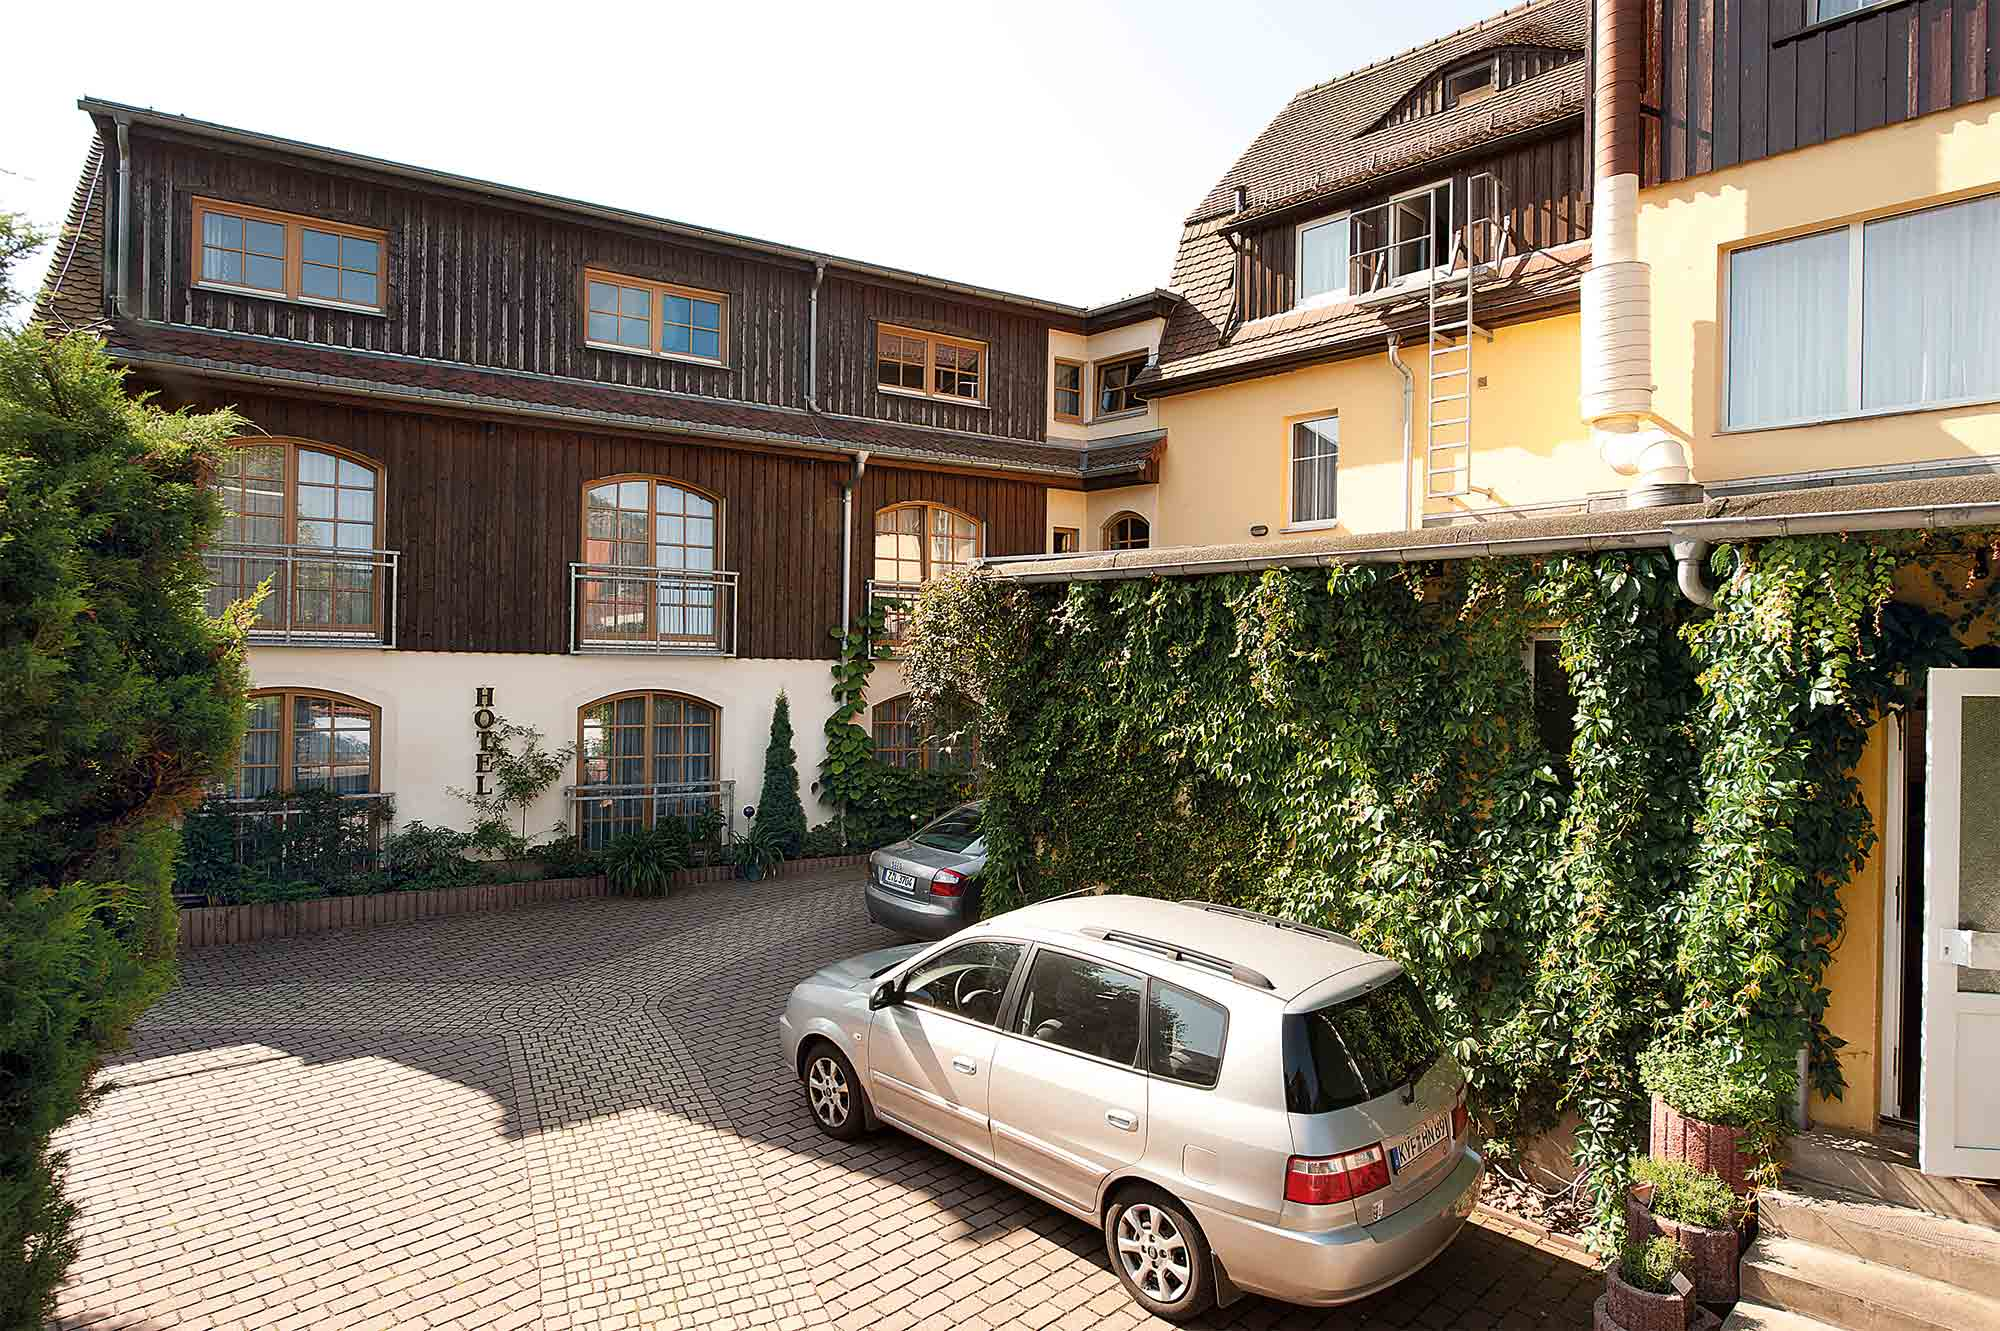 Www Ettrichs Hotel Rathen De